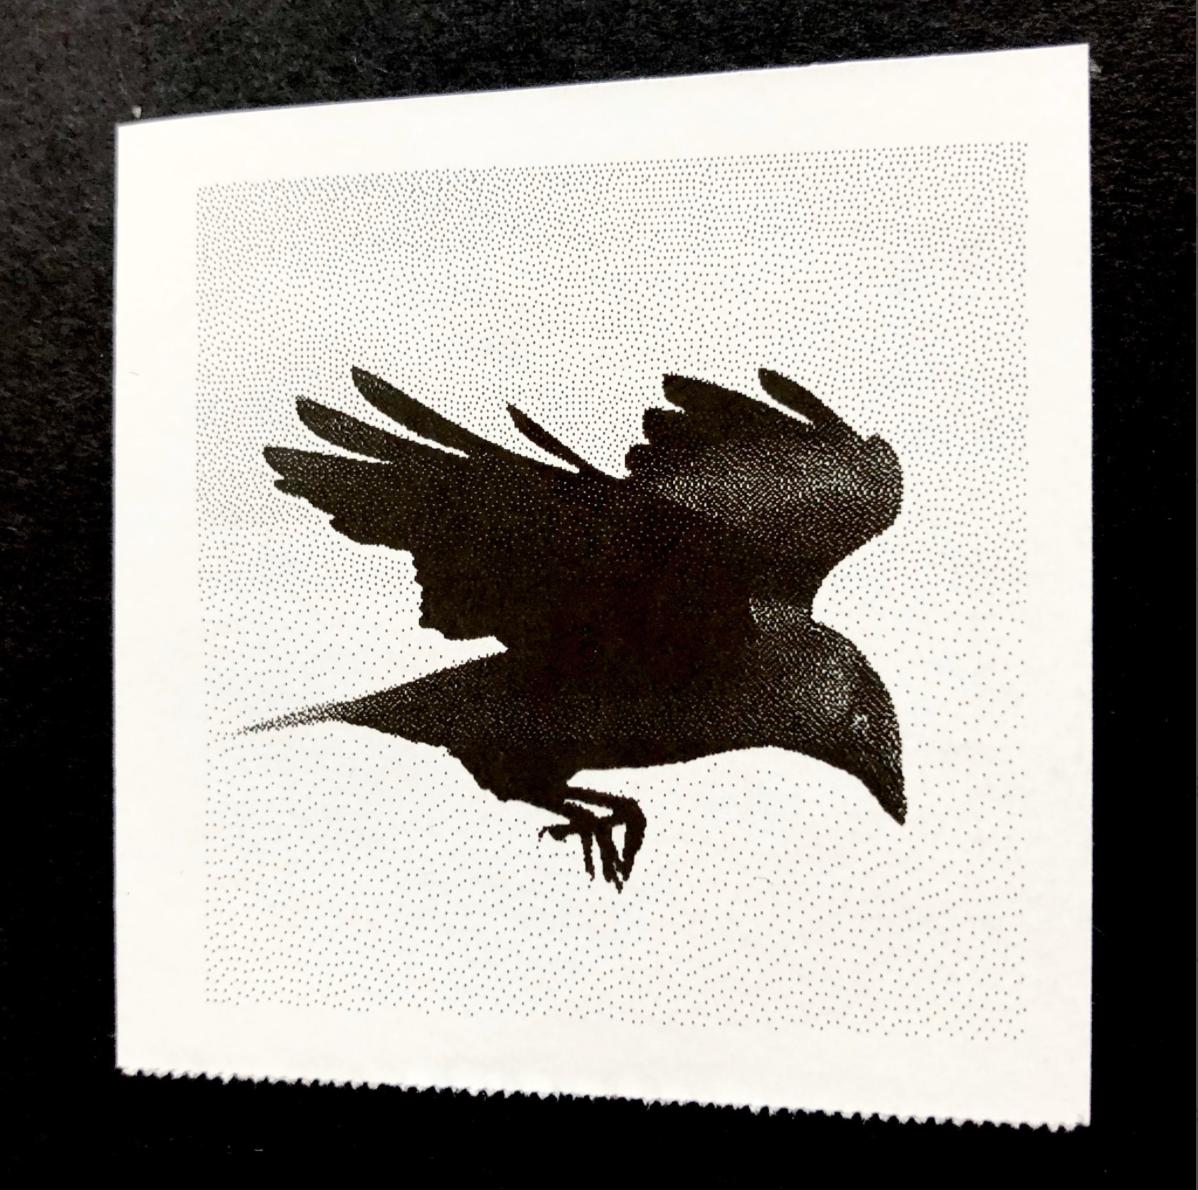 Birds of Firle - Jackdaw - Credit Tanya Shadrick